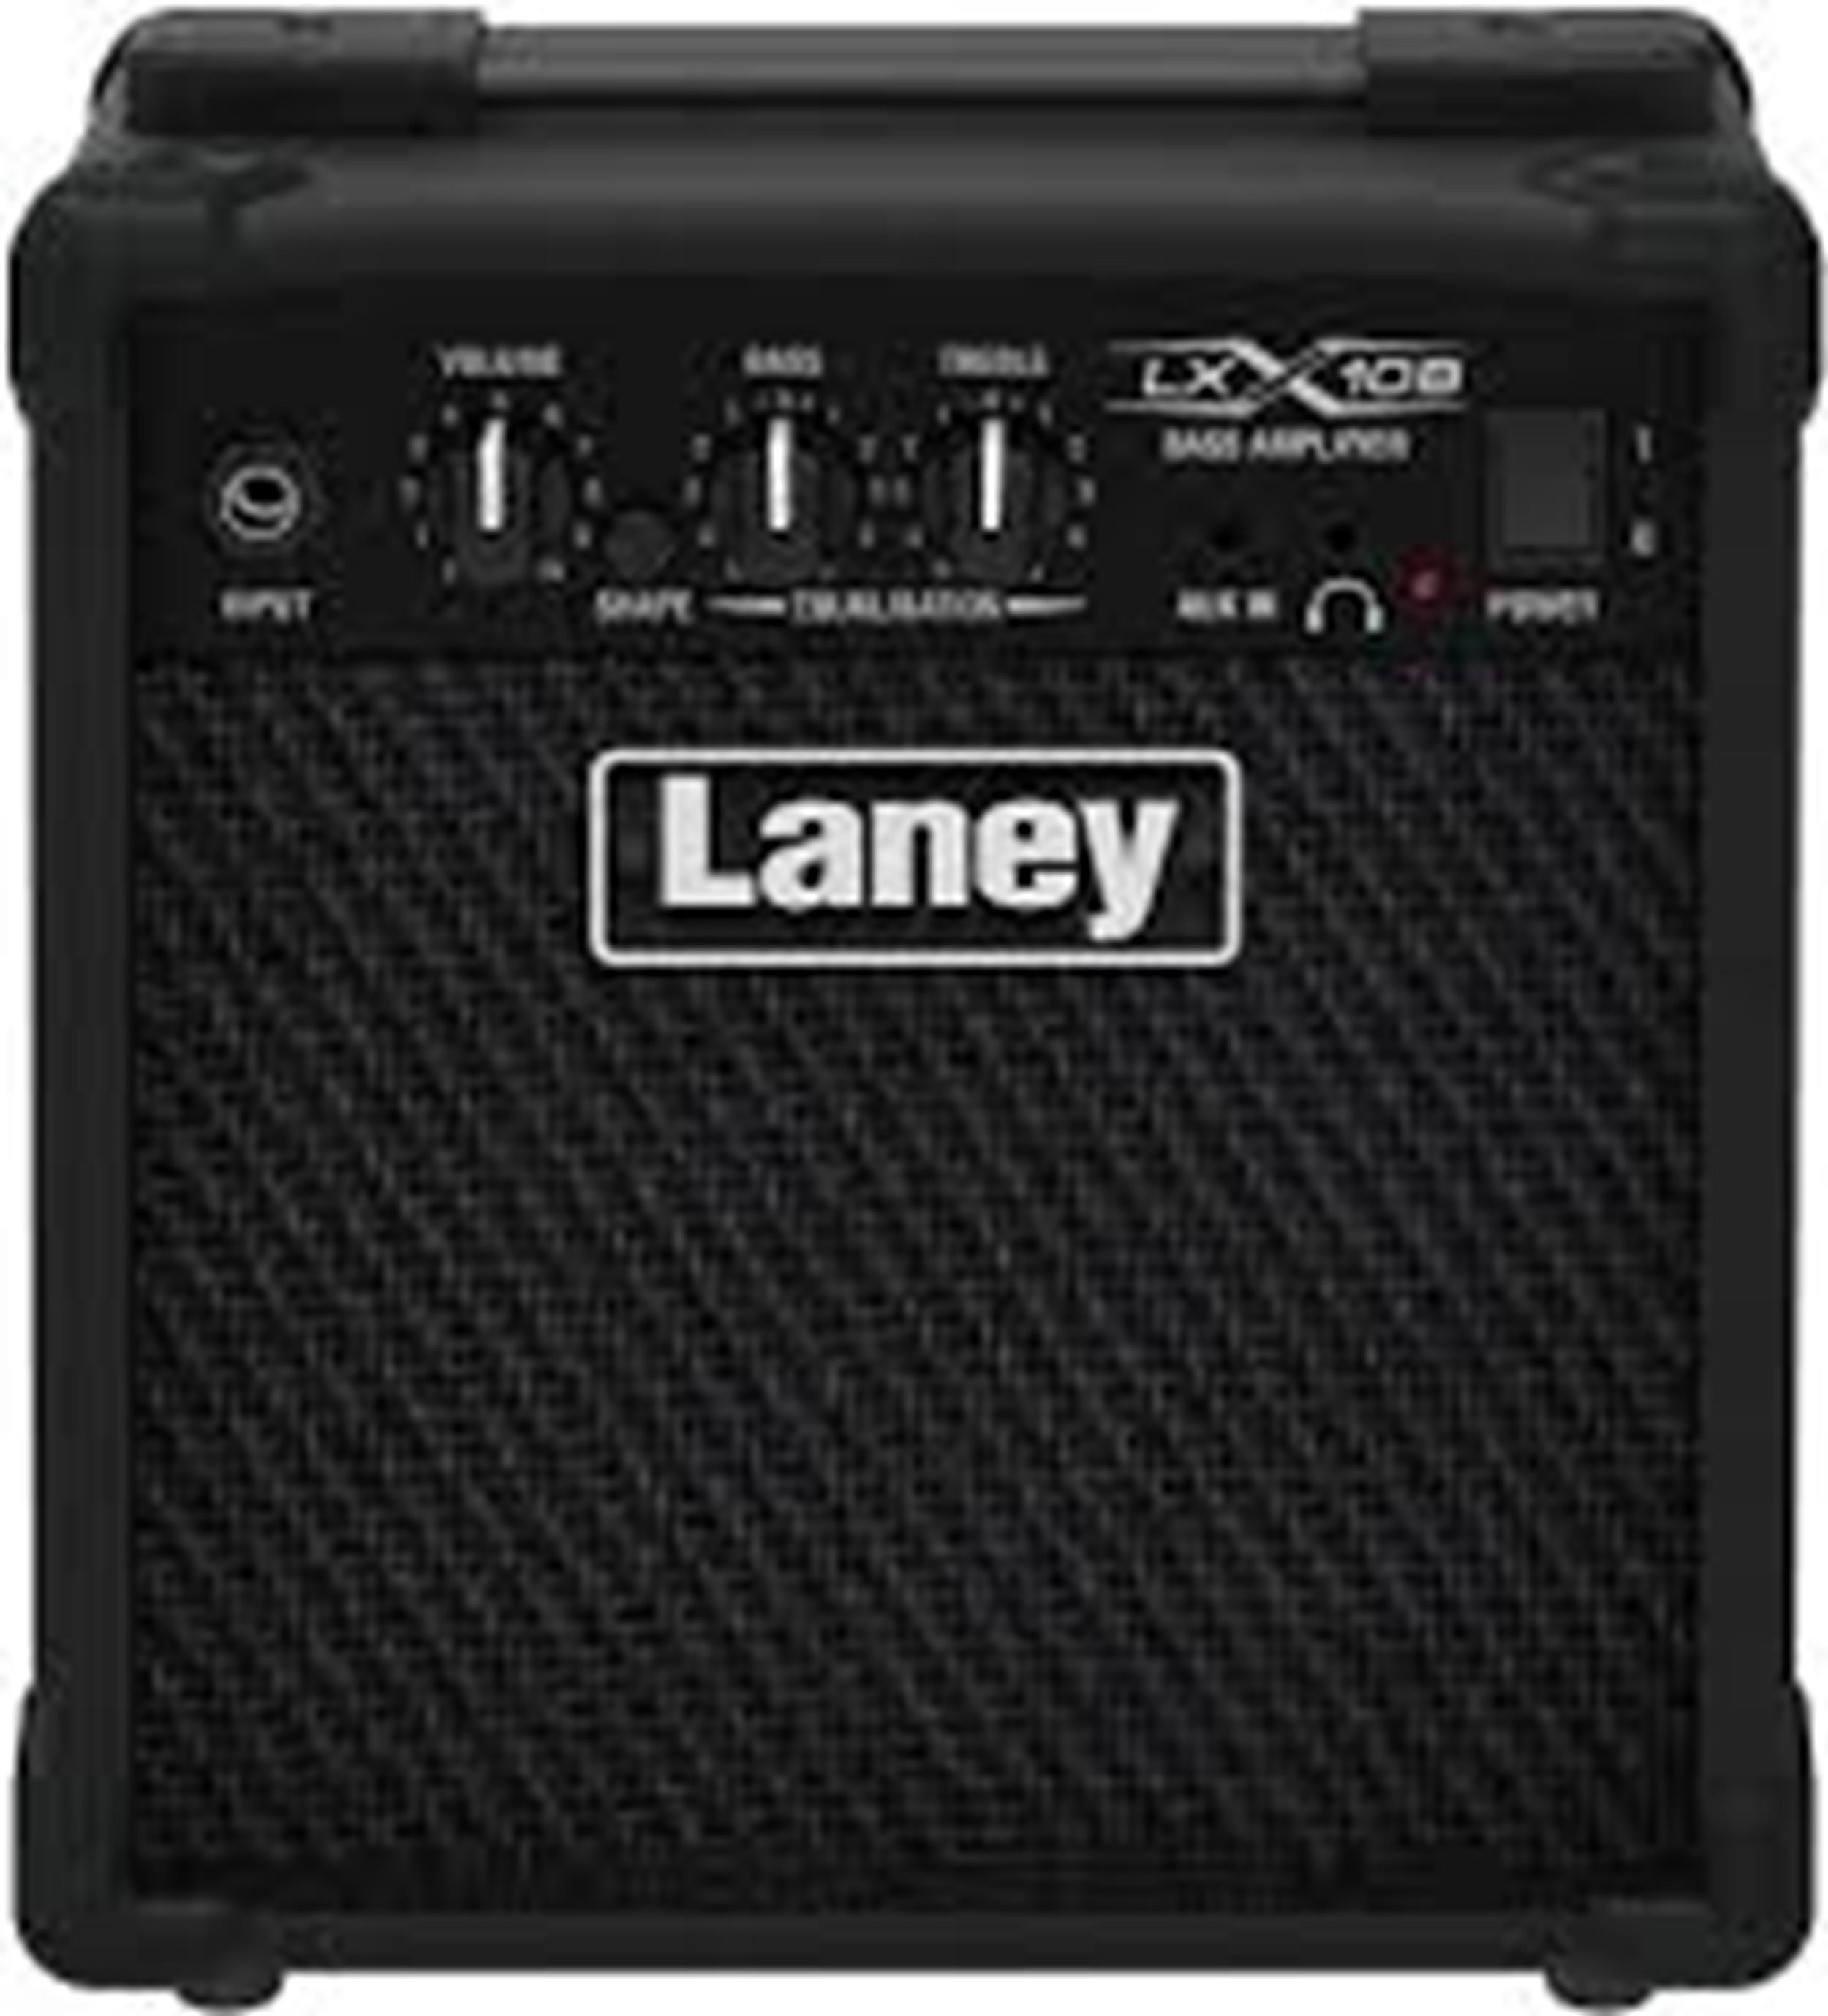 Laney-LX10B-combo-1x5-10W-sku-3041269424001